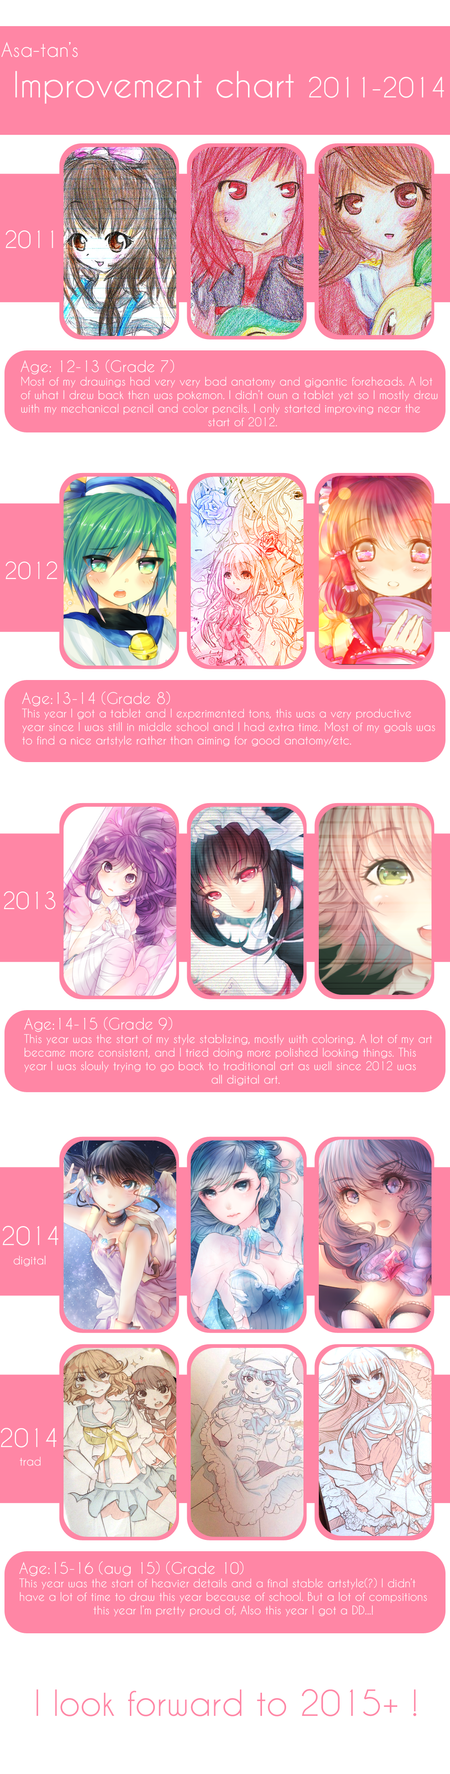 Improvement meme 2011-2014 by Asa-tan